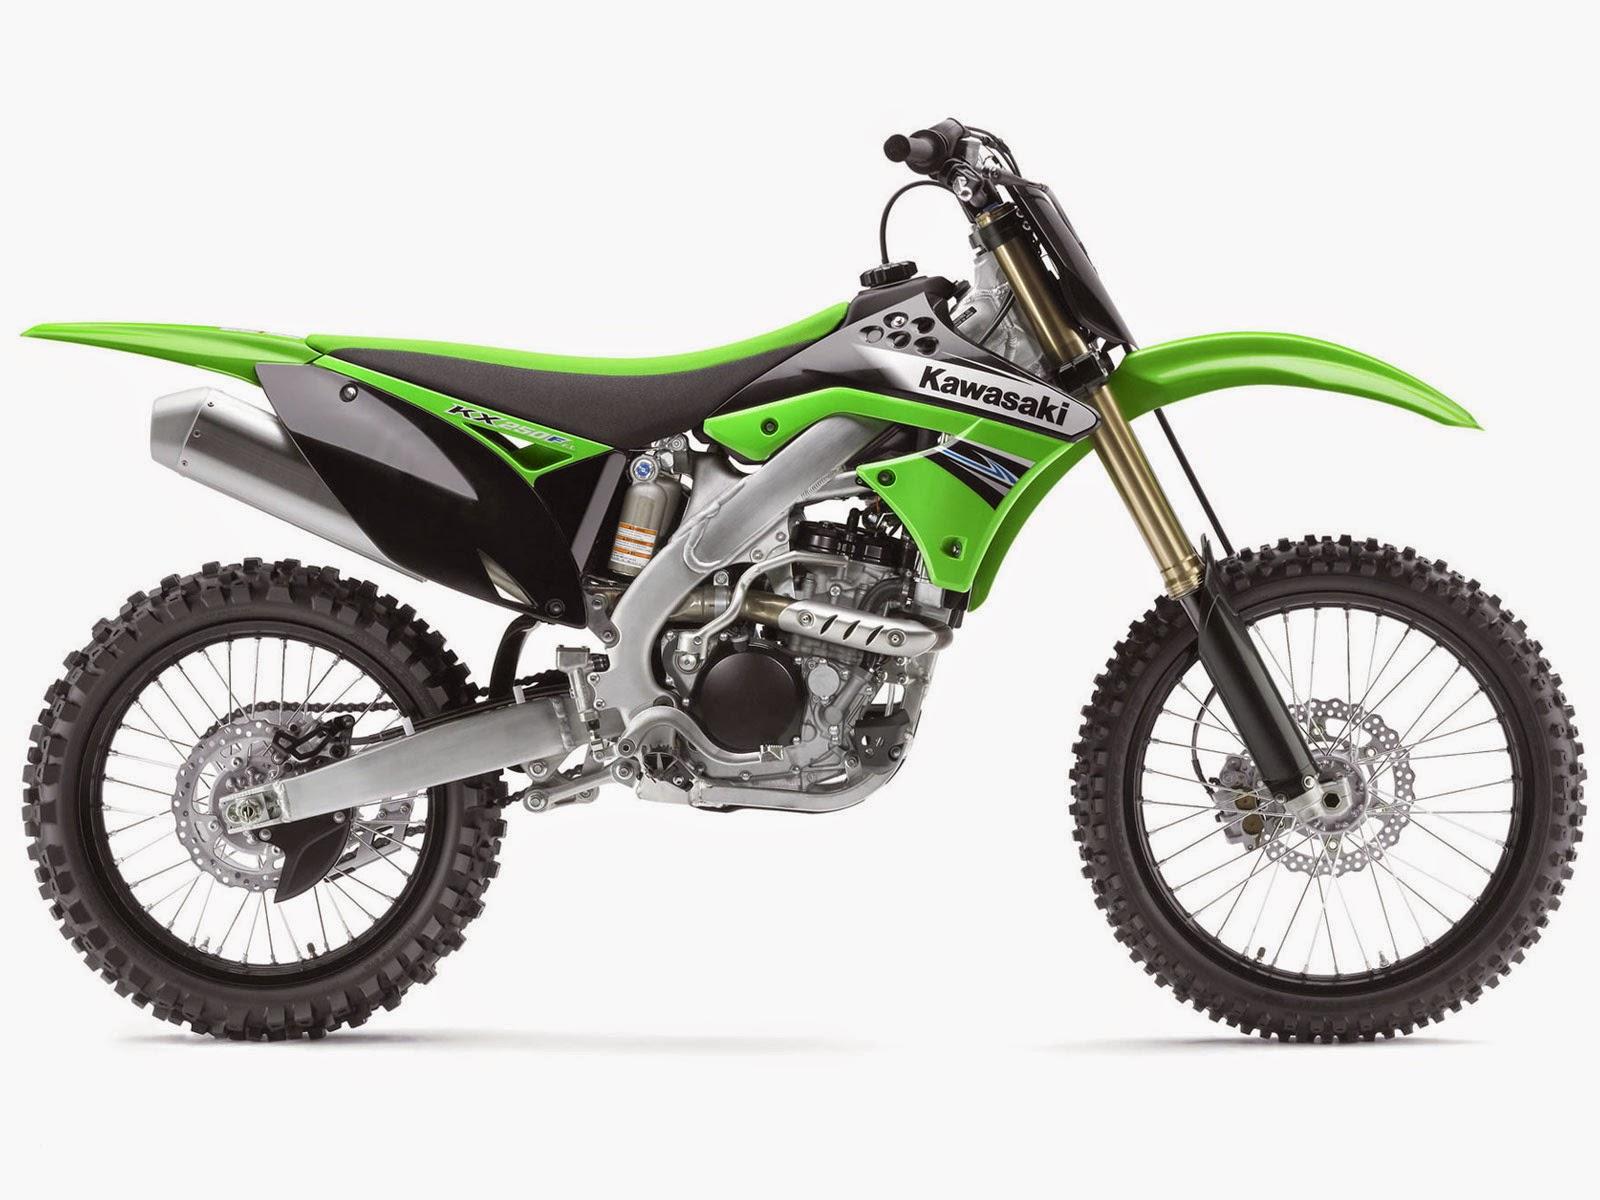 Kawasaki d tracker modifikasi supermoto kawasaki klx 150 modif